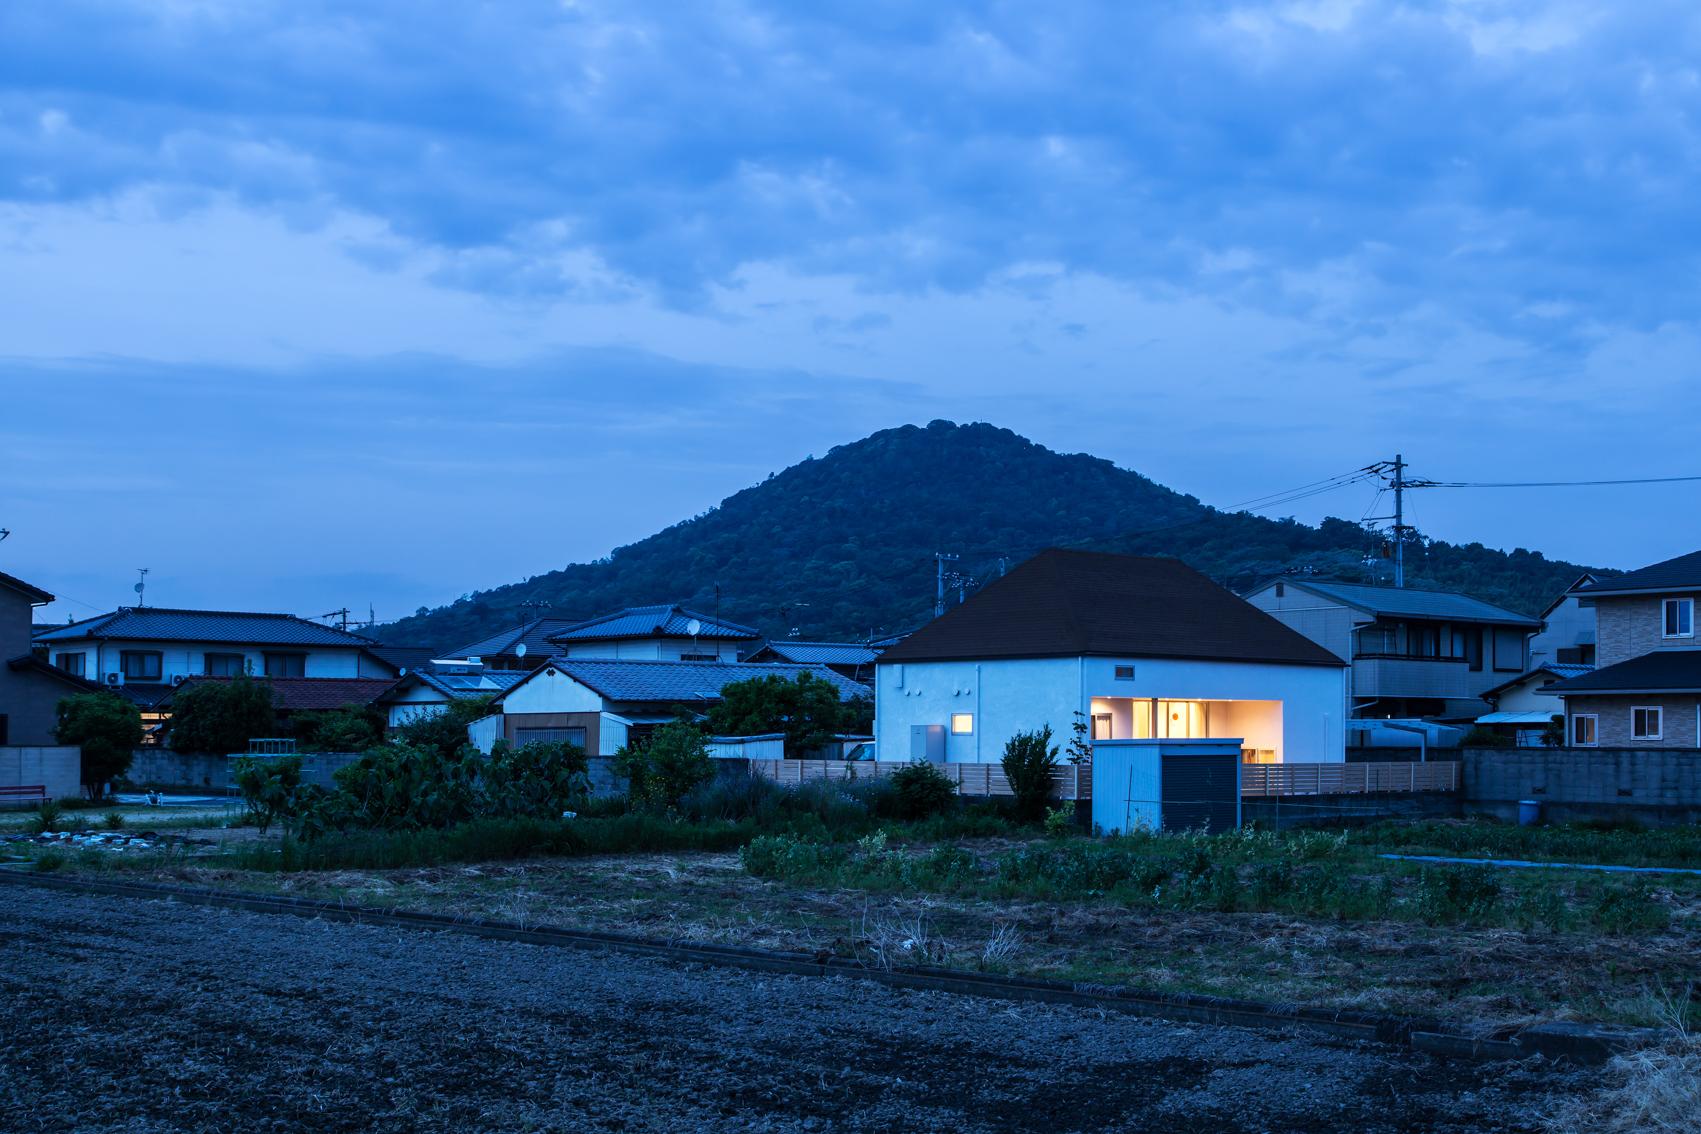 堀部直子 / Horibe Associates architect's